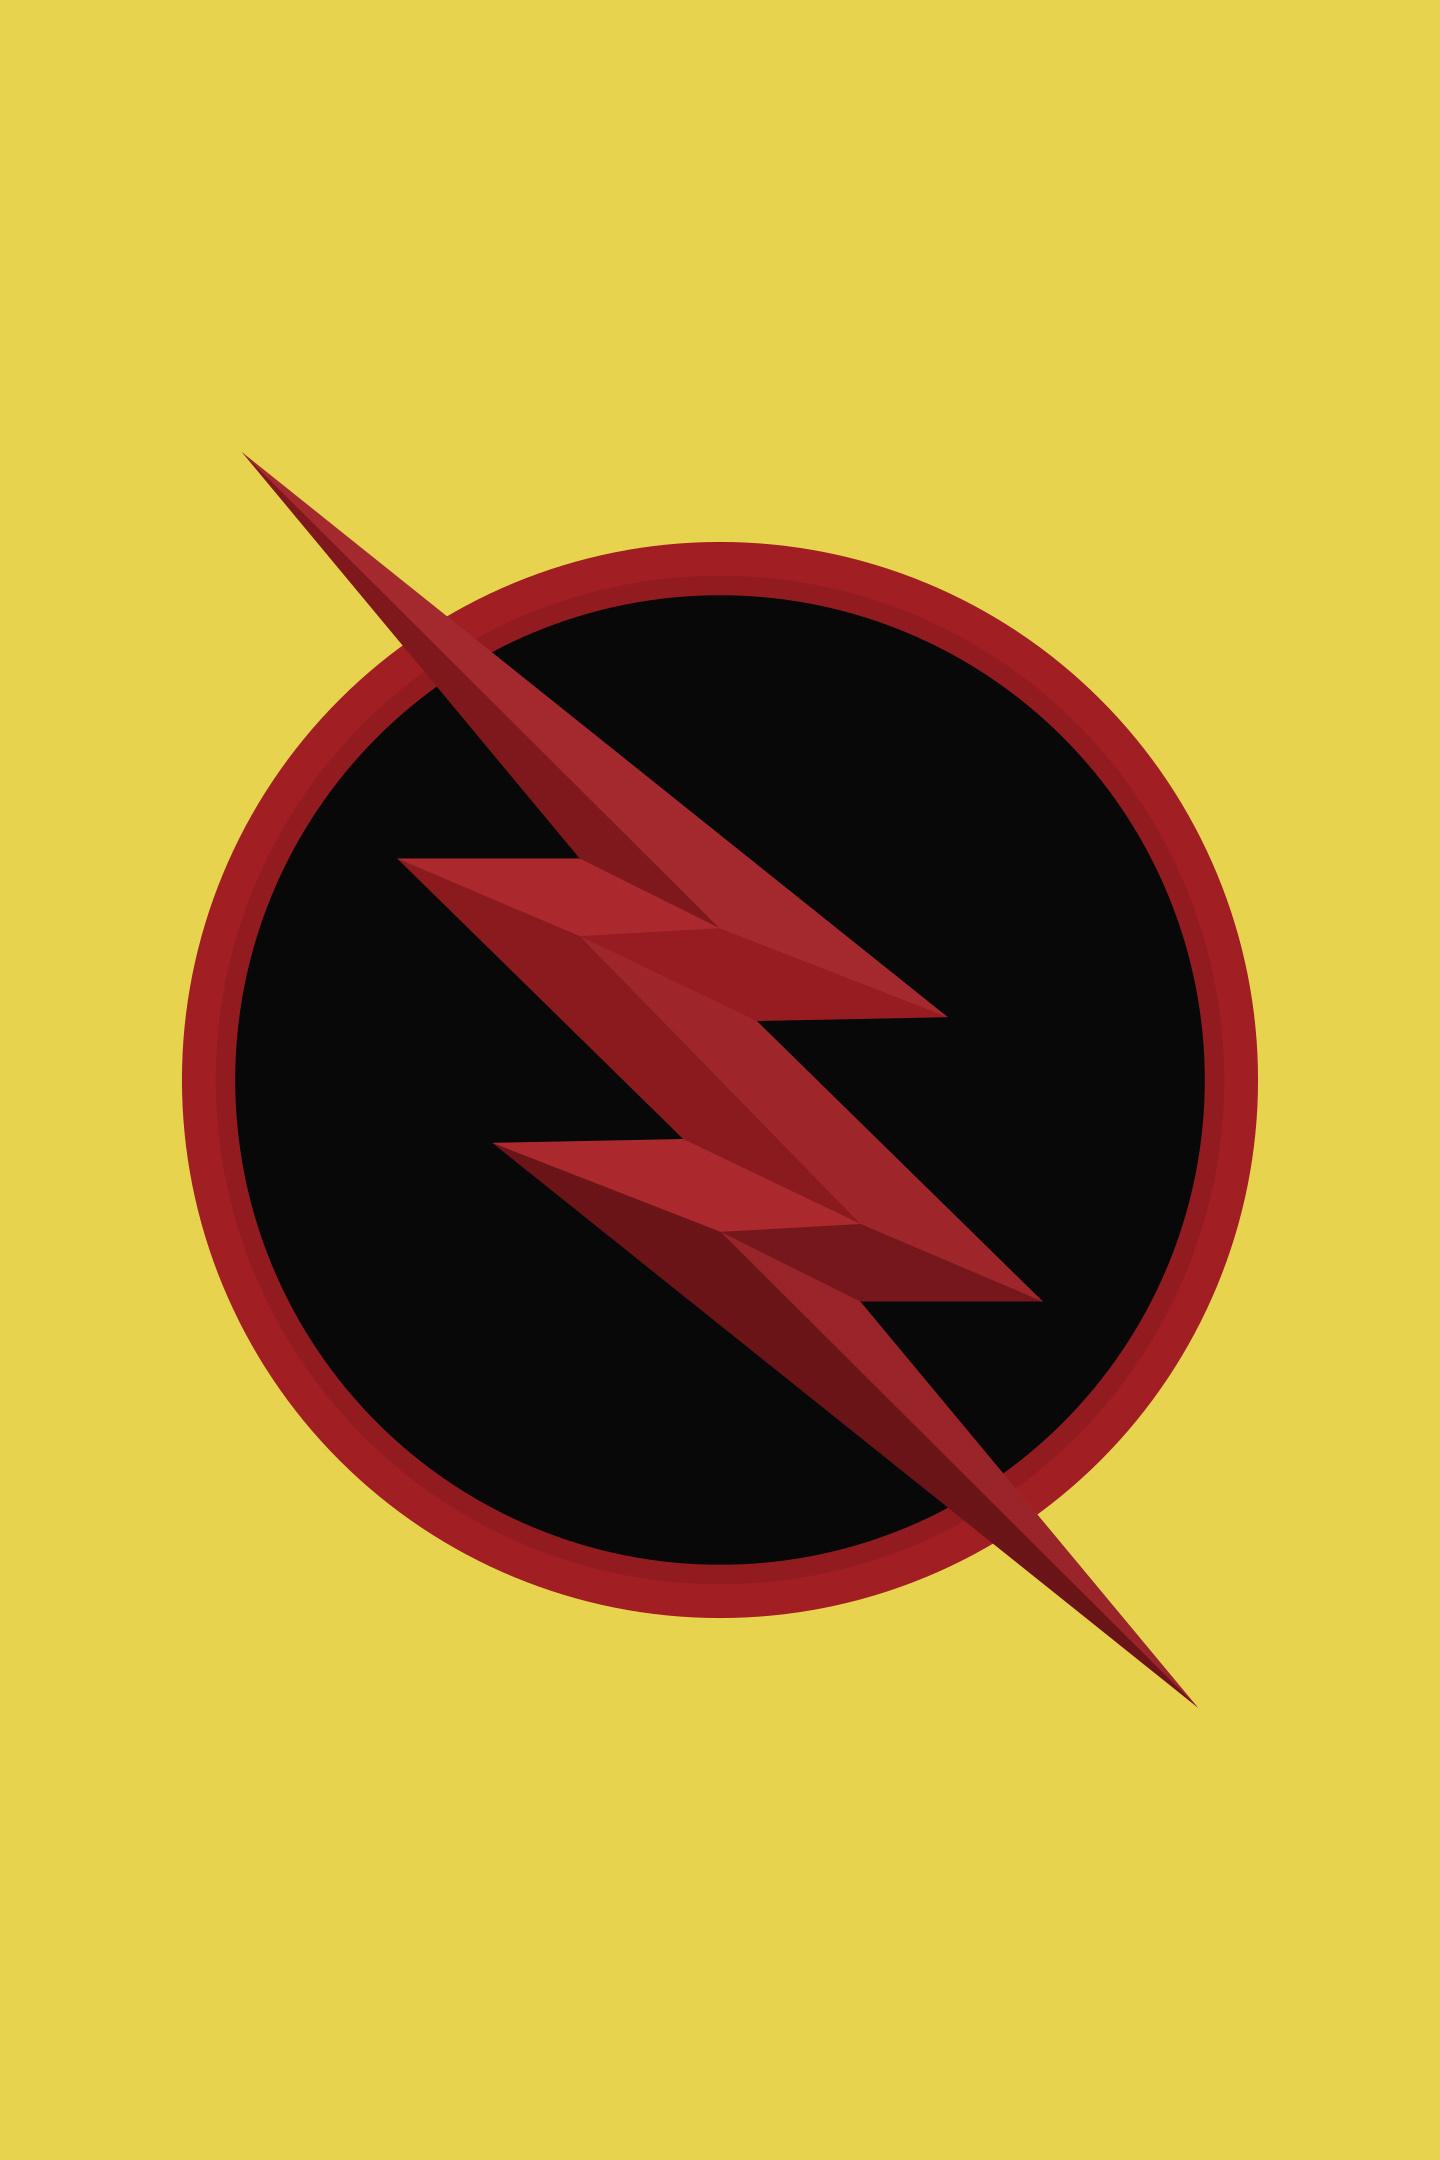 Download 1440x2960 Wallpaper Reverse Flash Logo Dc Comics